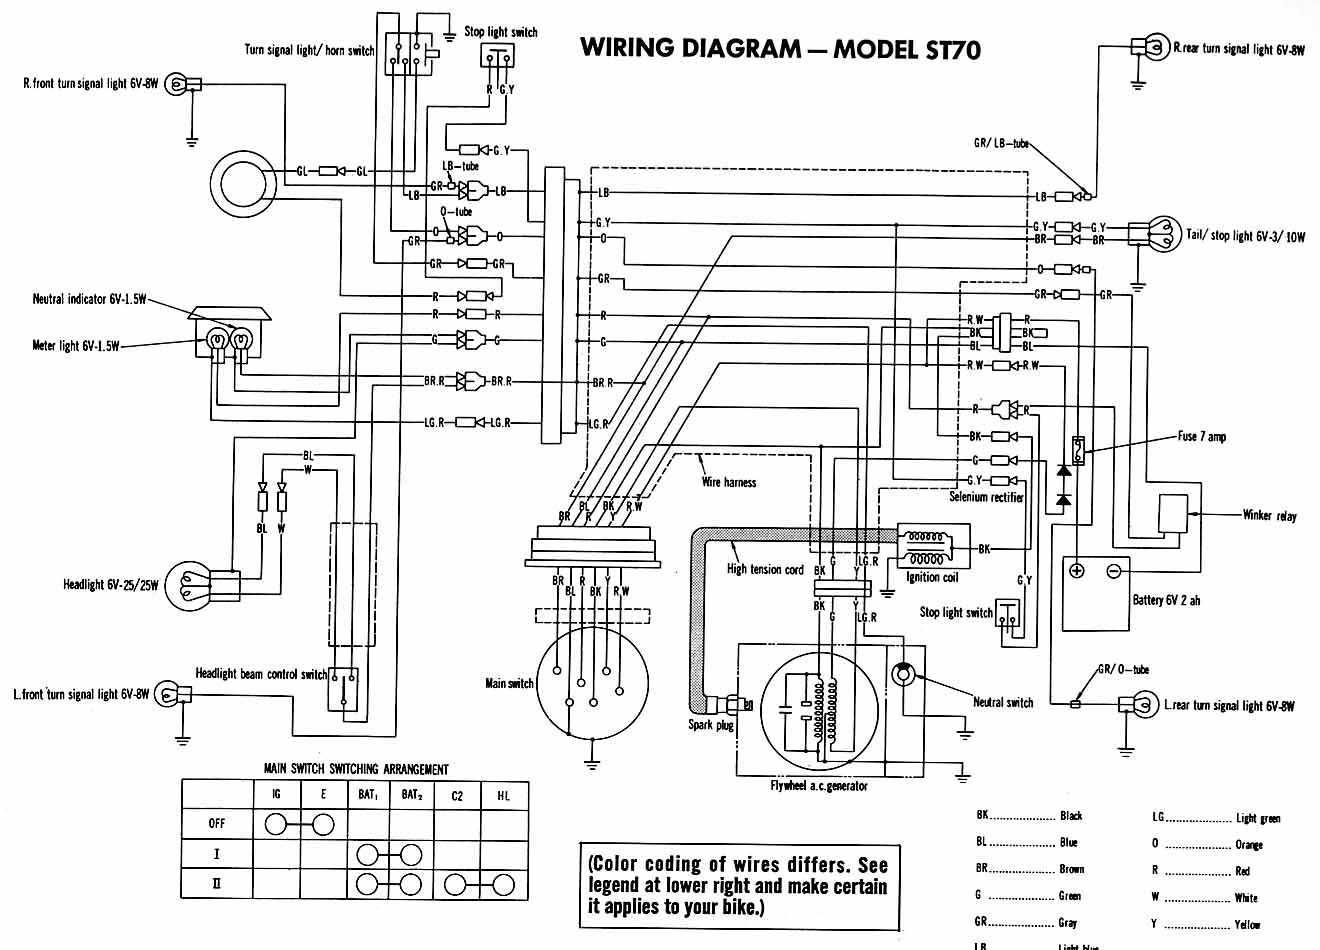 1993 Honda Shadow 600 Wiring Diagram Explained Diagrams 1984 700 Vlx Nemetas Aufgegabelt Info Schematic